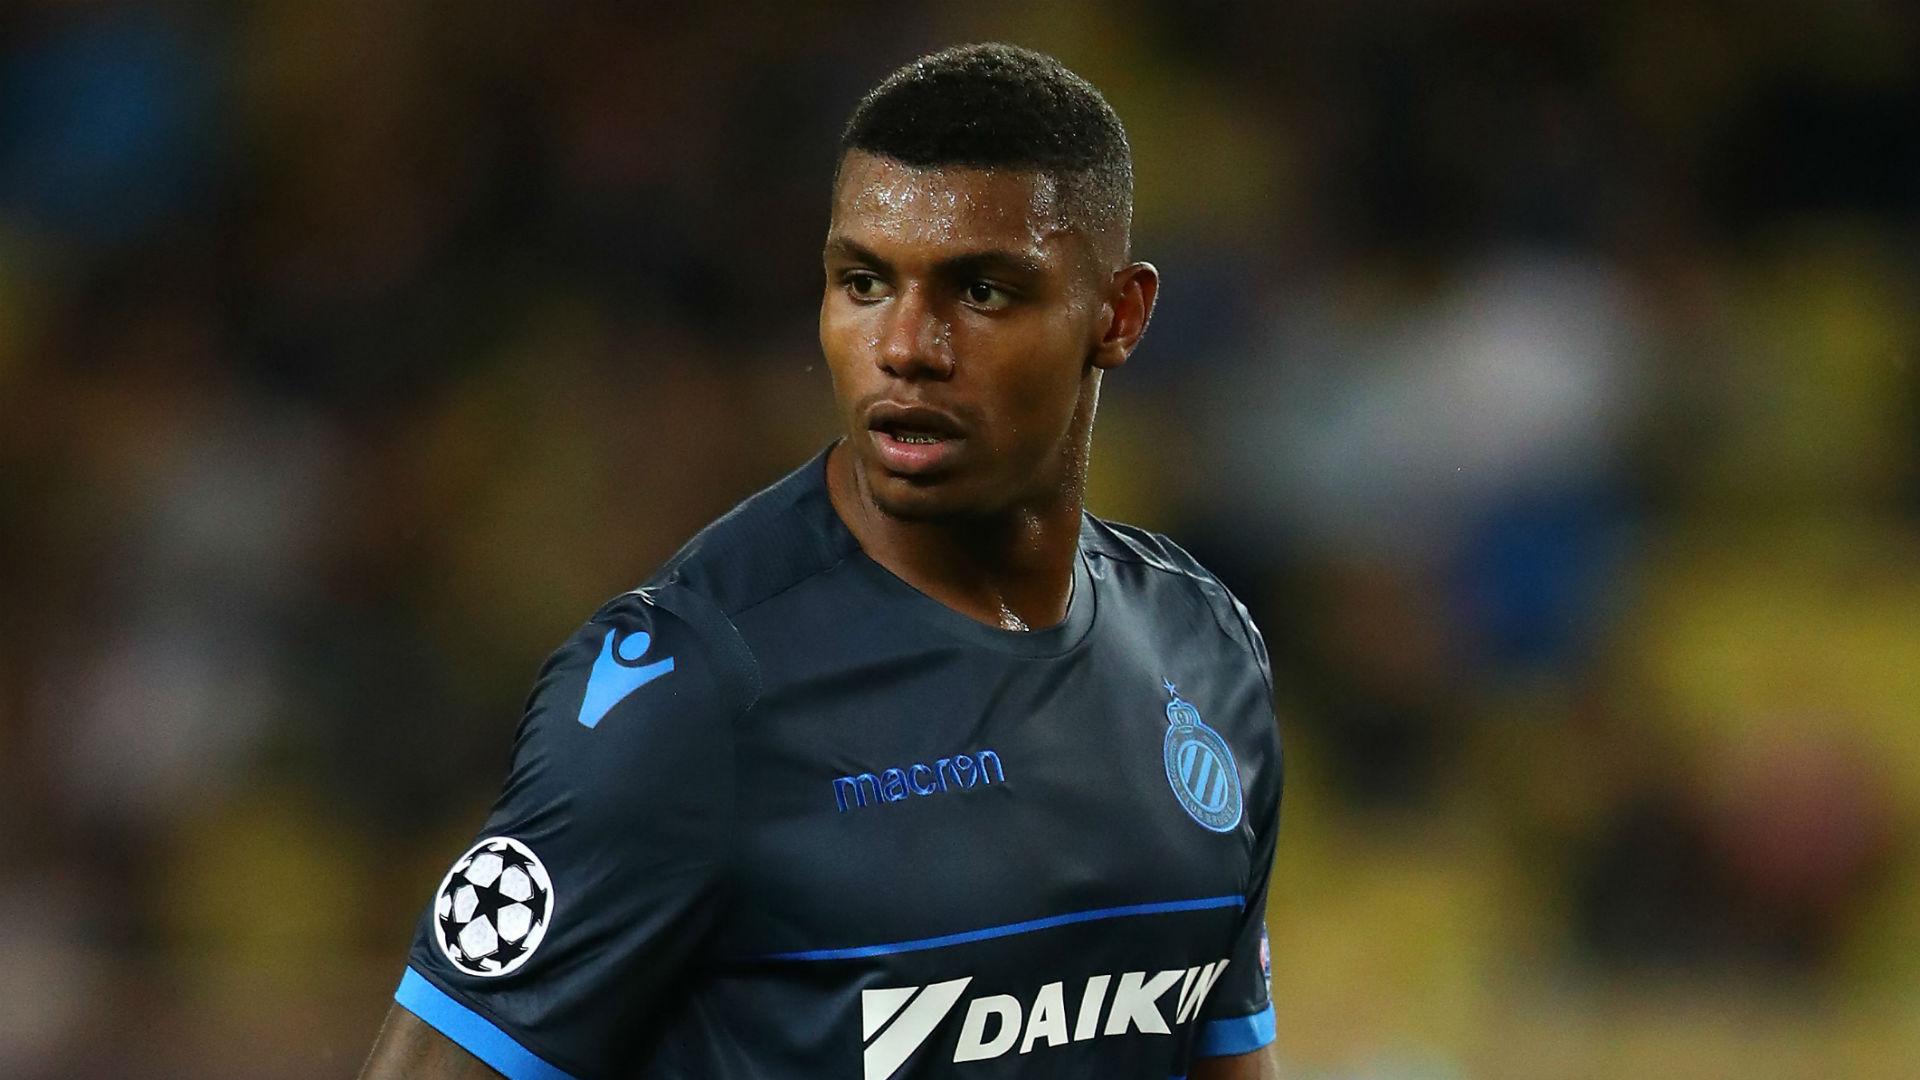 Aston Villa sign striker Wesley from Club Brugge